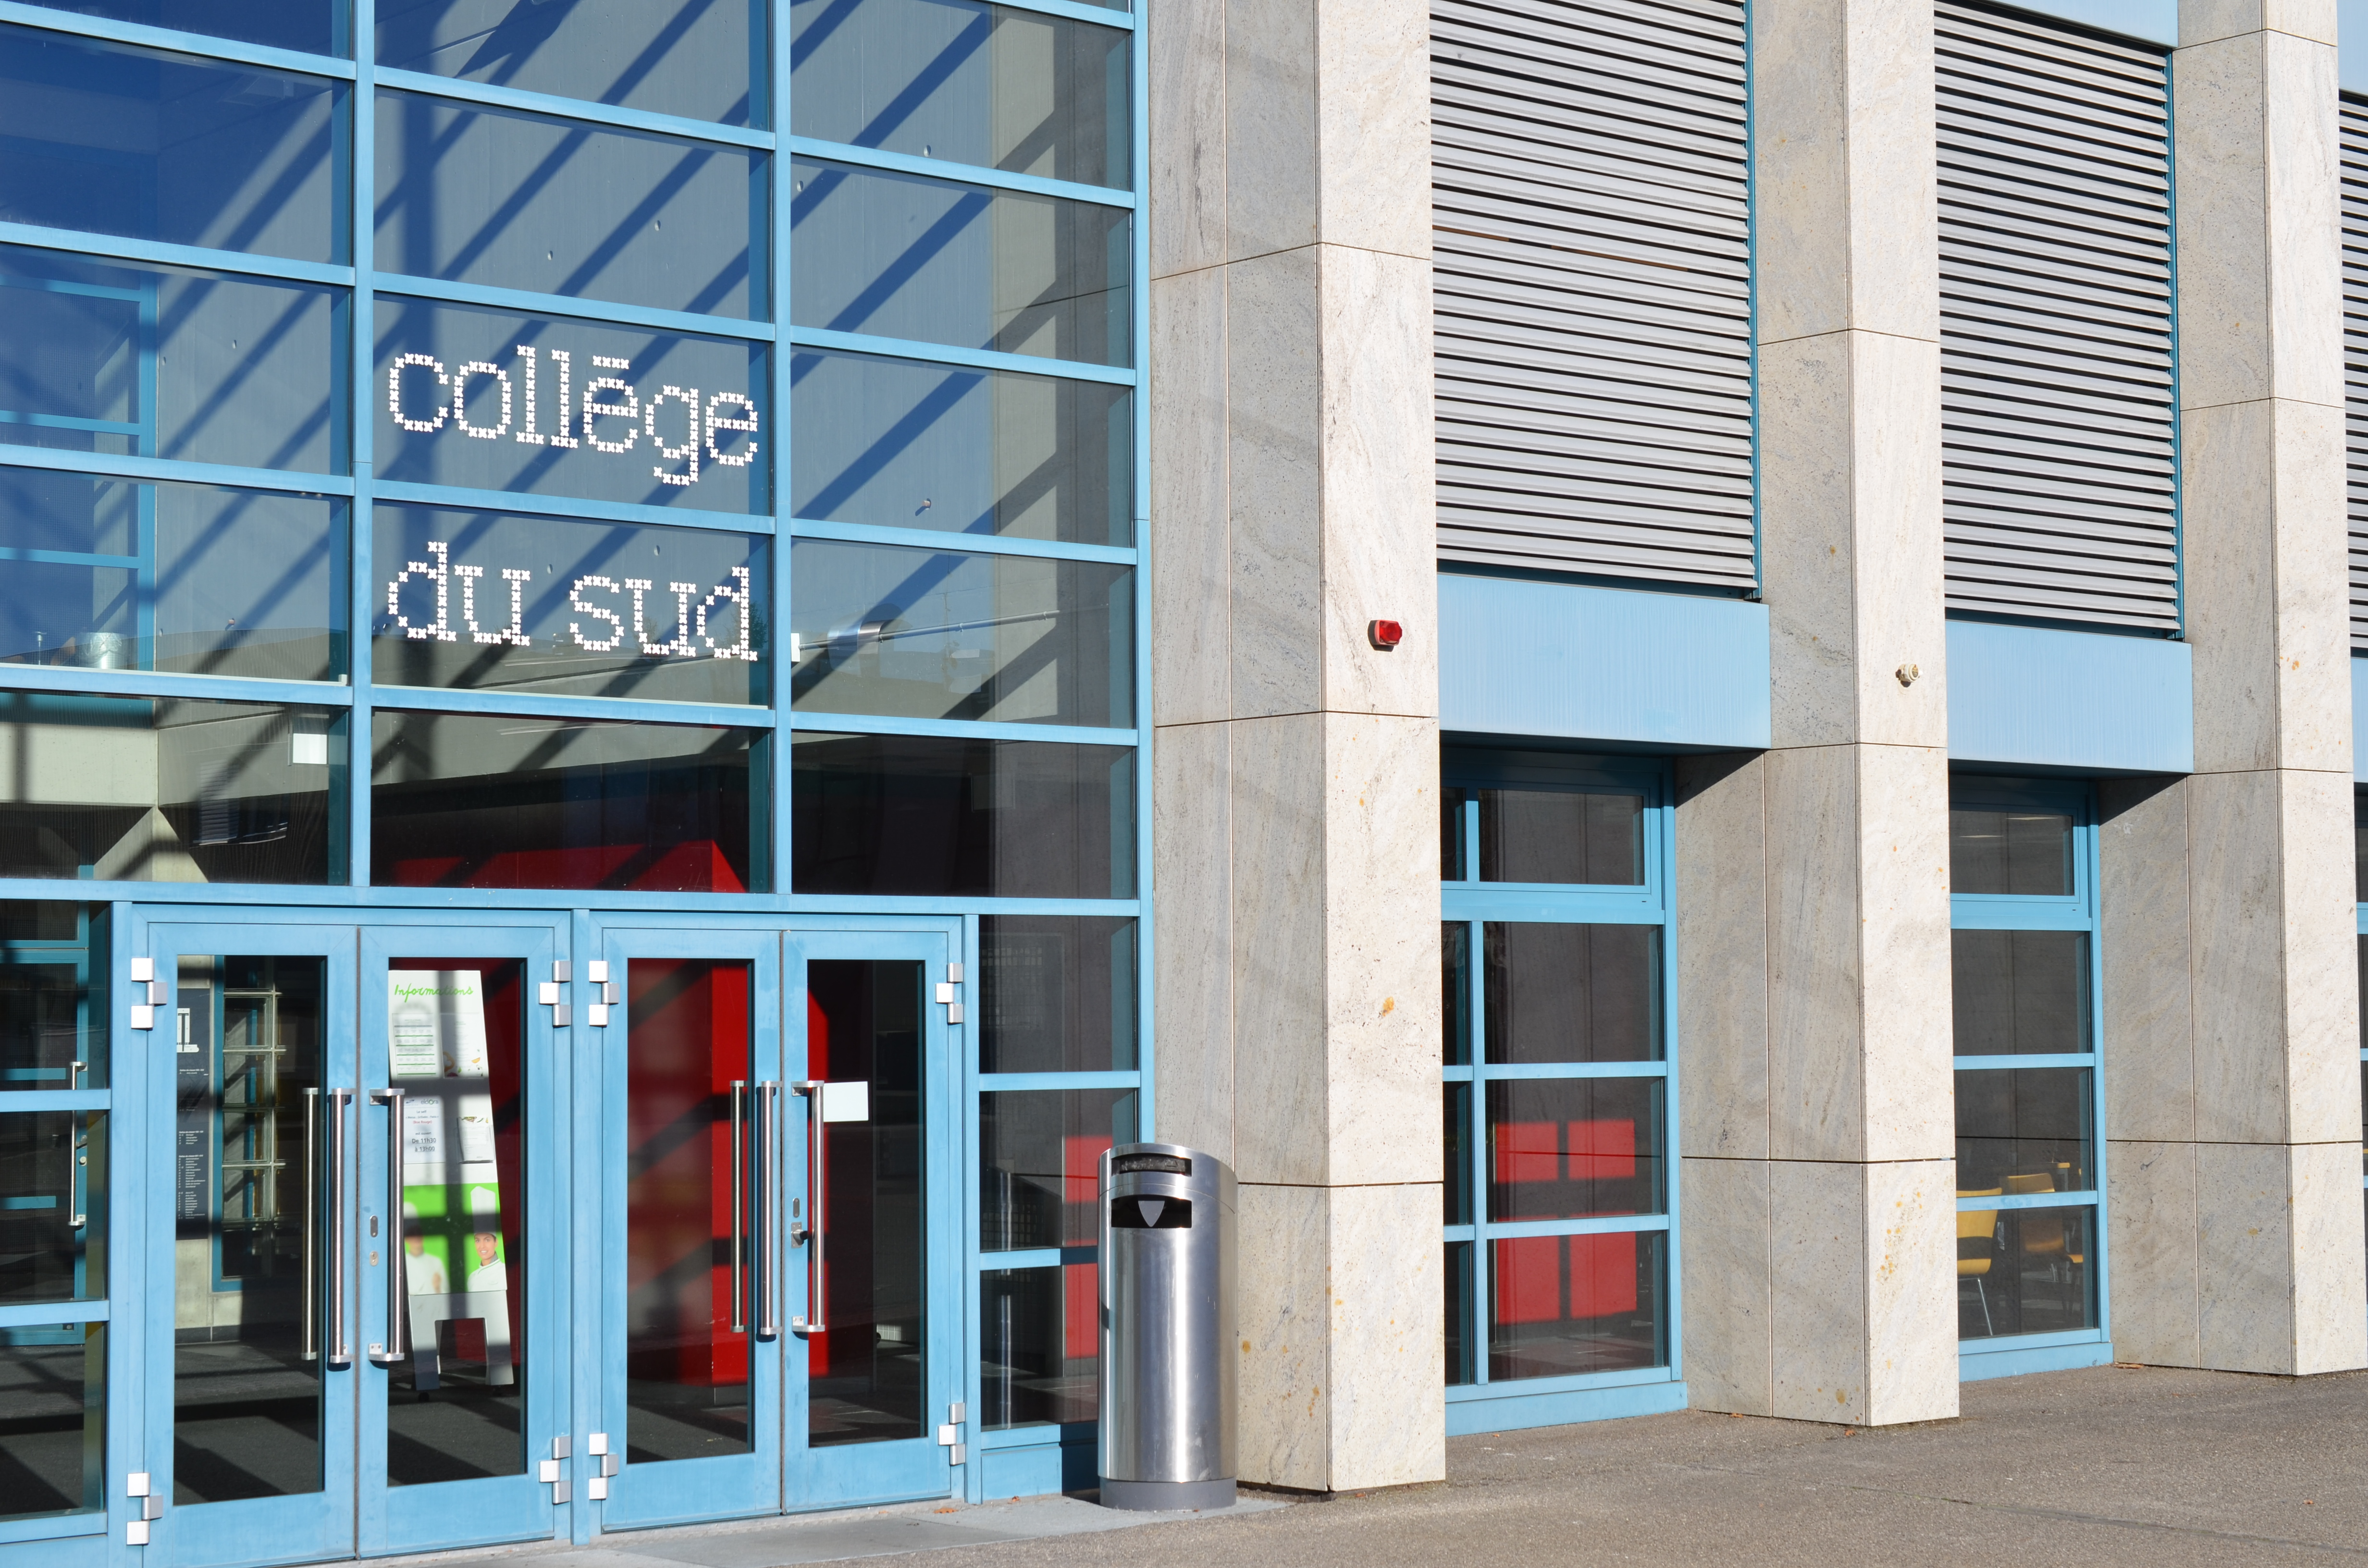 Collège_du_Sud_Bulle_005